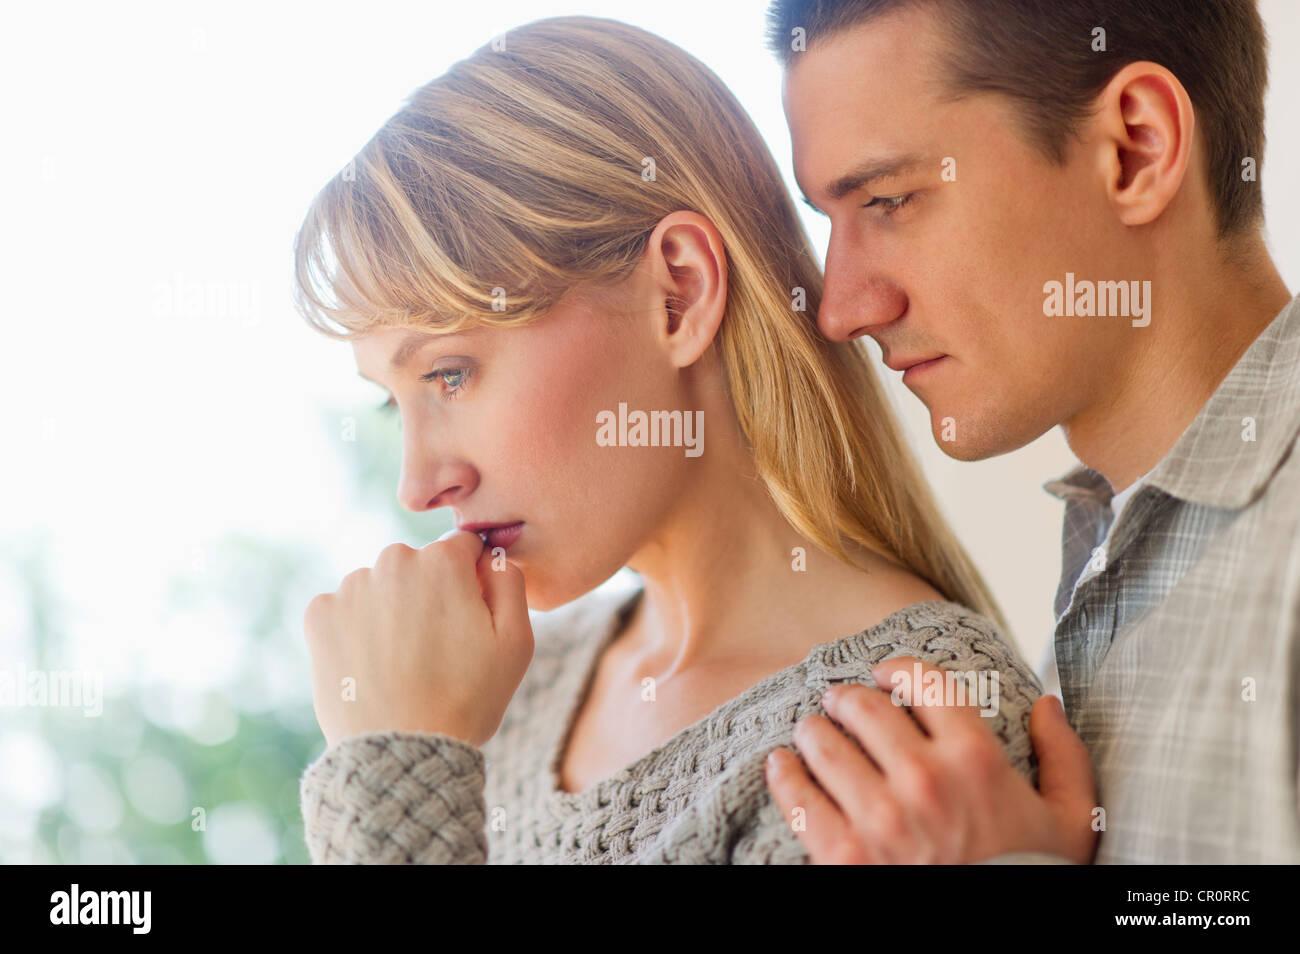 USA, New Jersey, Jersey City, Portrait de couple triste Photo Stock